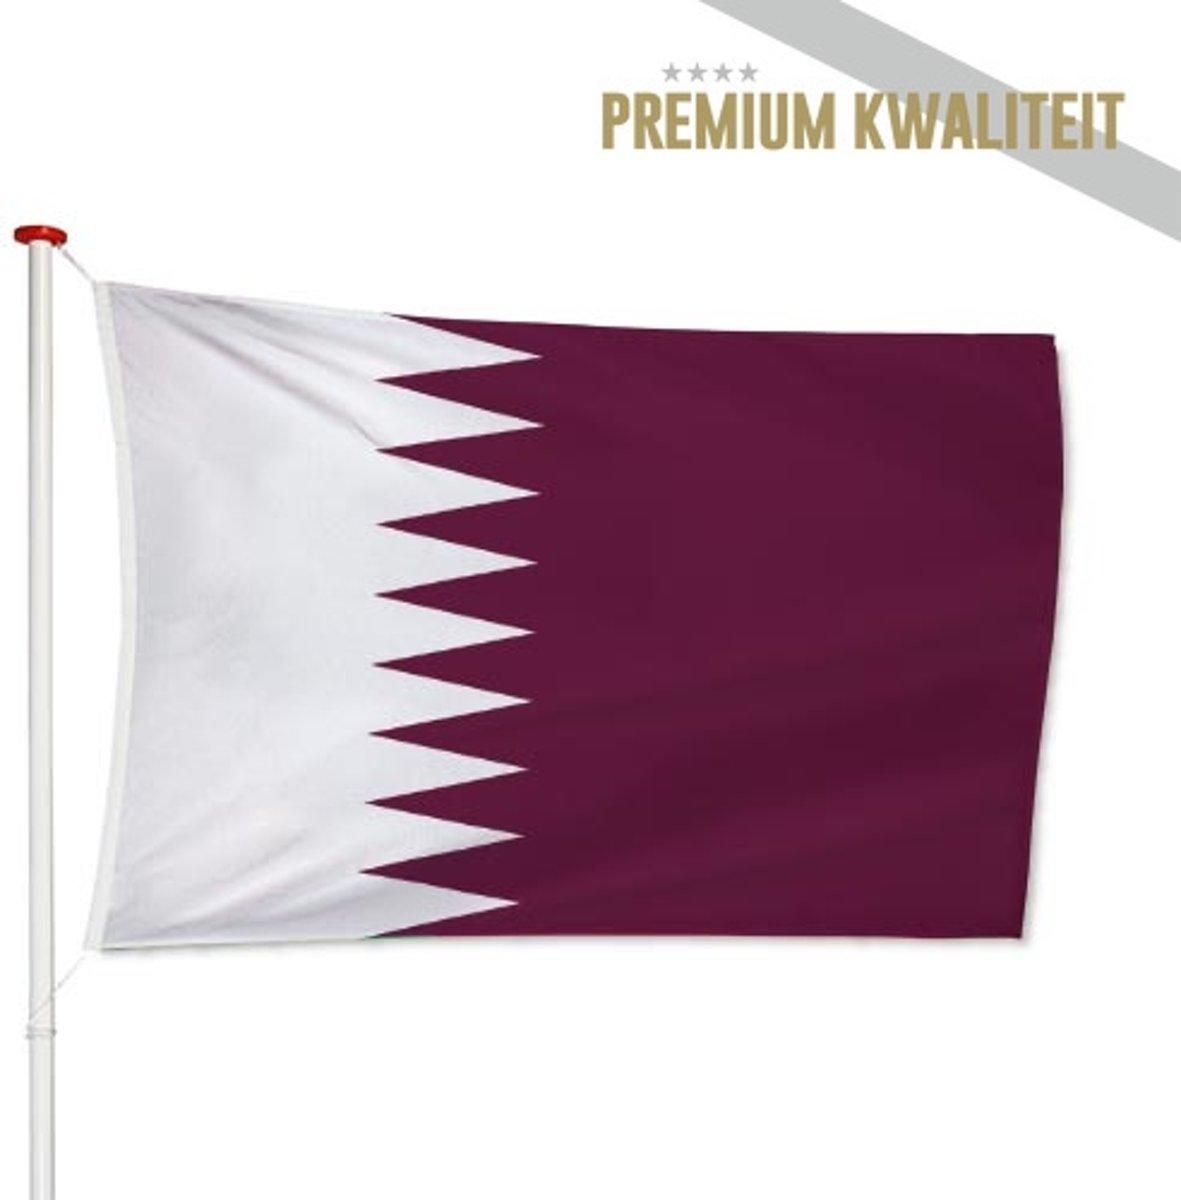 Qatarese Vlag Qatar 100x150cm kopen